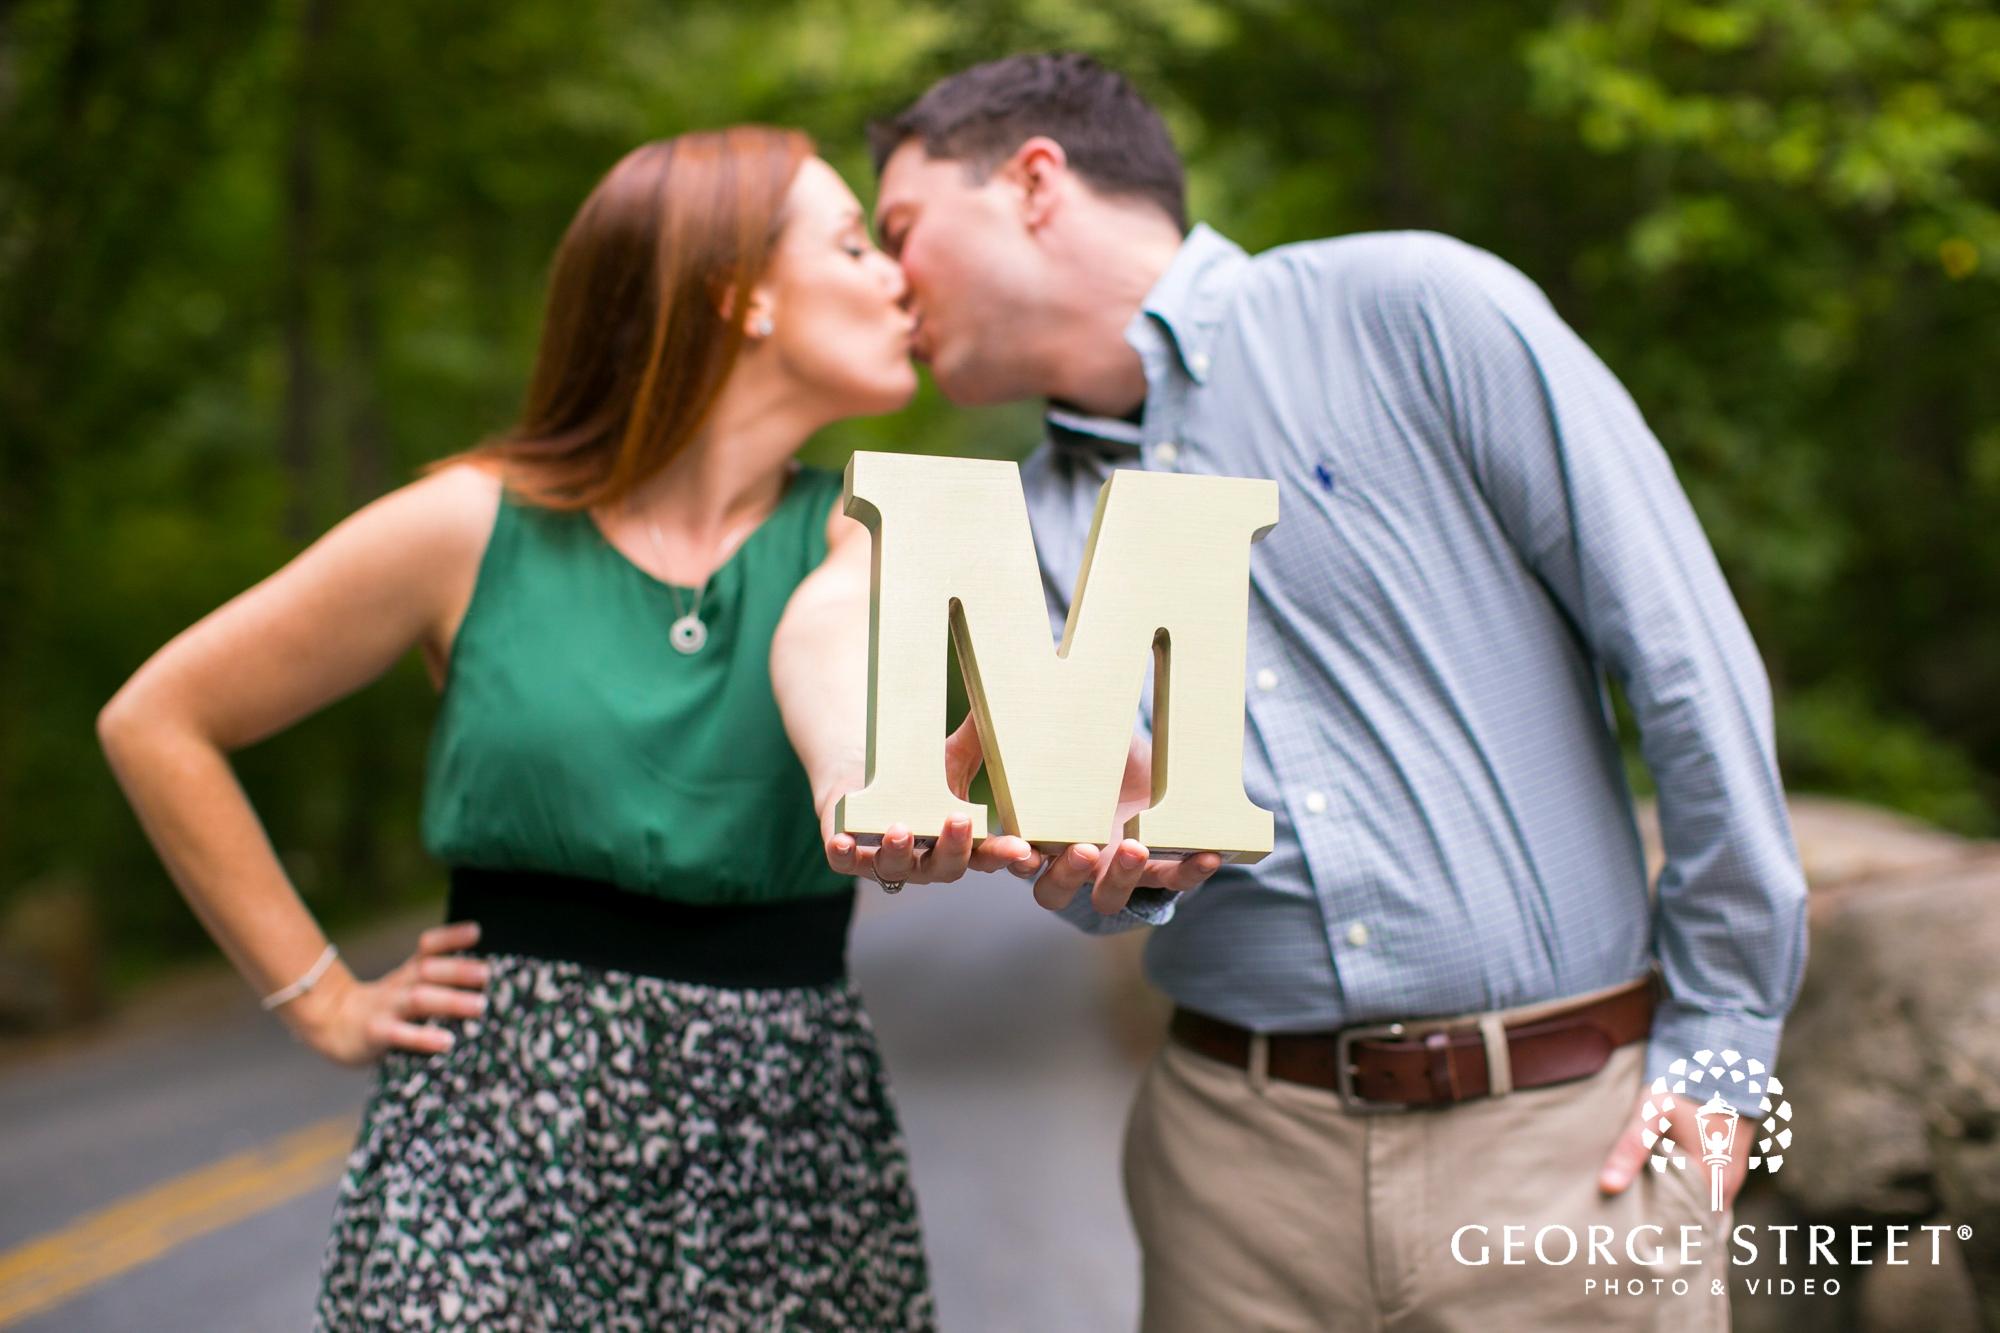 couple kissing behind letter rural portrait